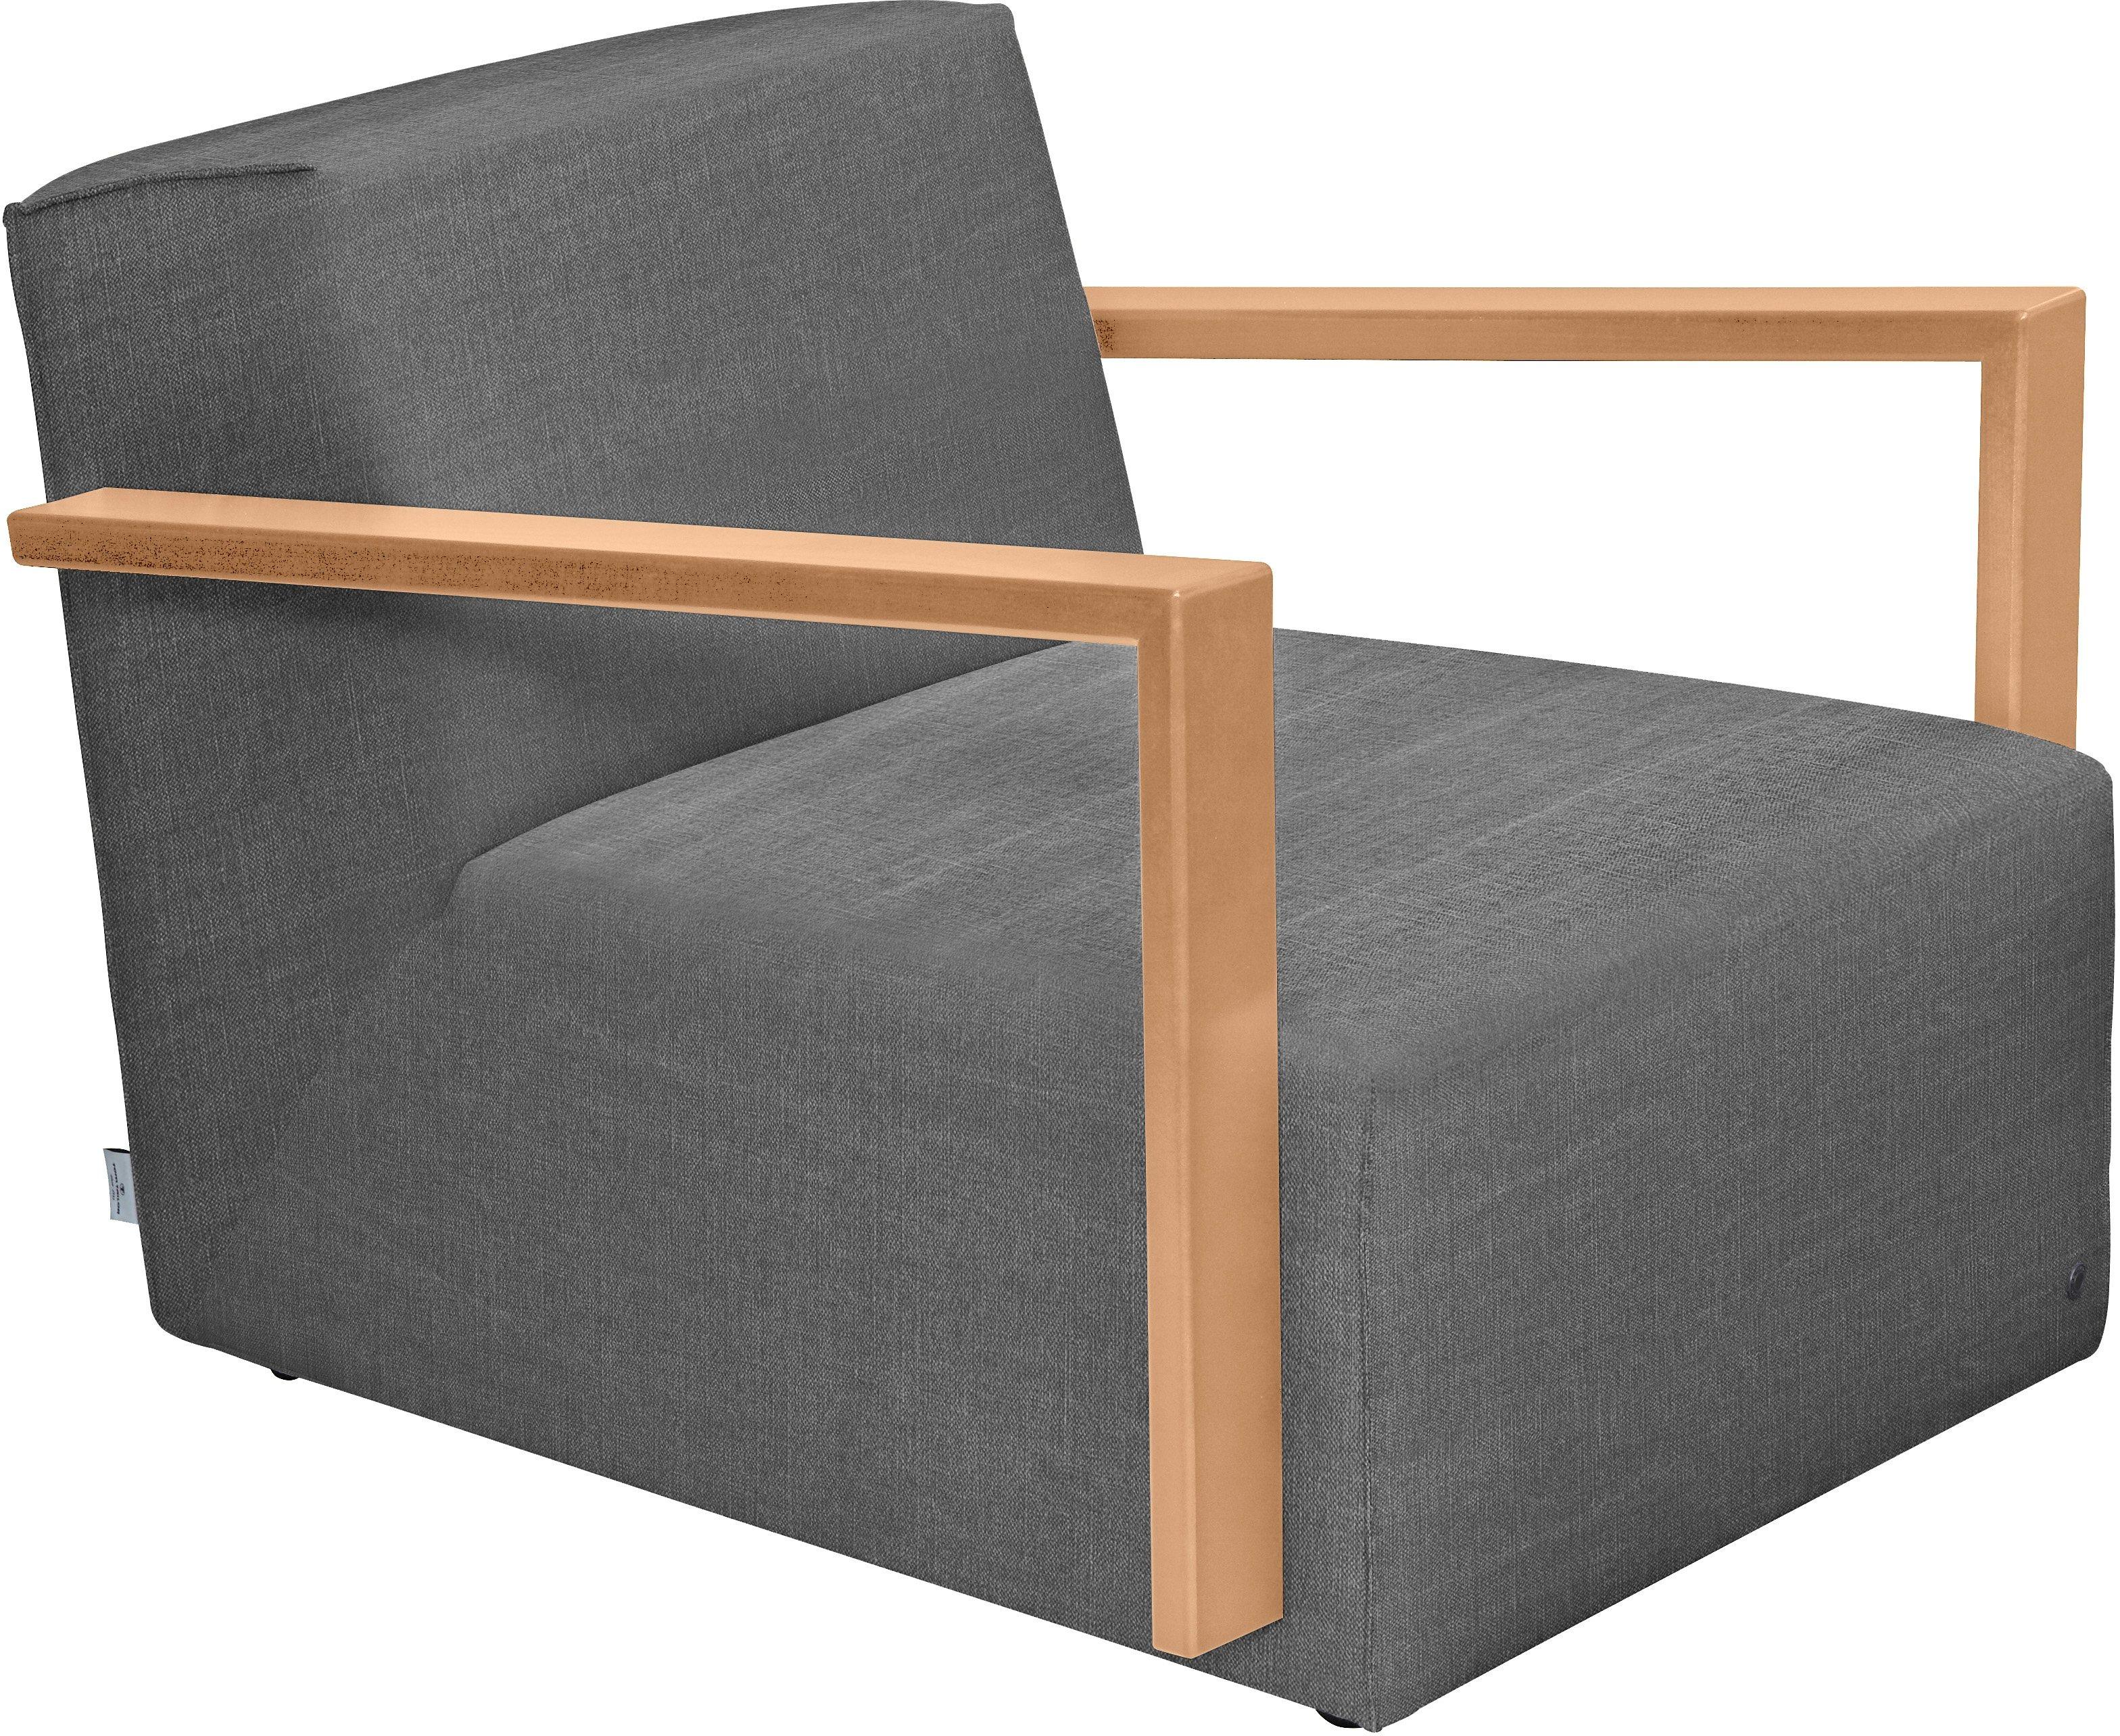 tom tailor loungesessel mit armlehne lazy im retrolook armlehne buche natur grau online. Black Bedroom Furniture Sets. Home Design Ideas